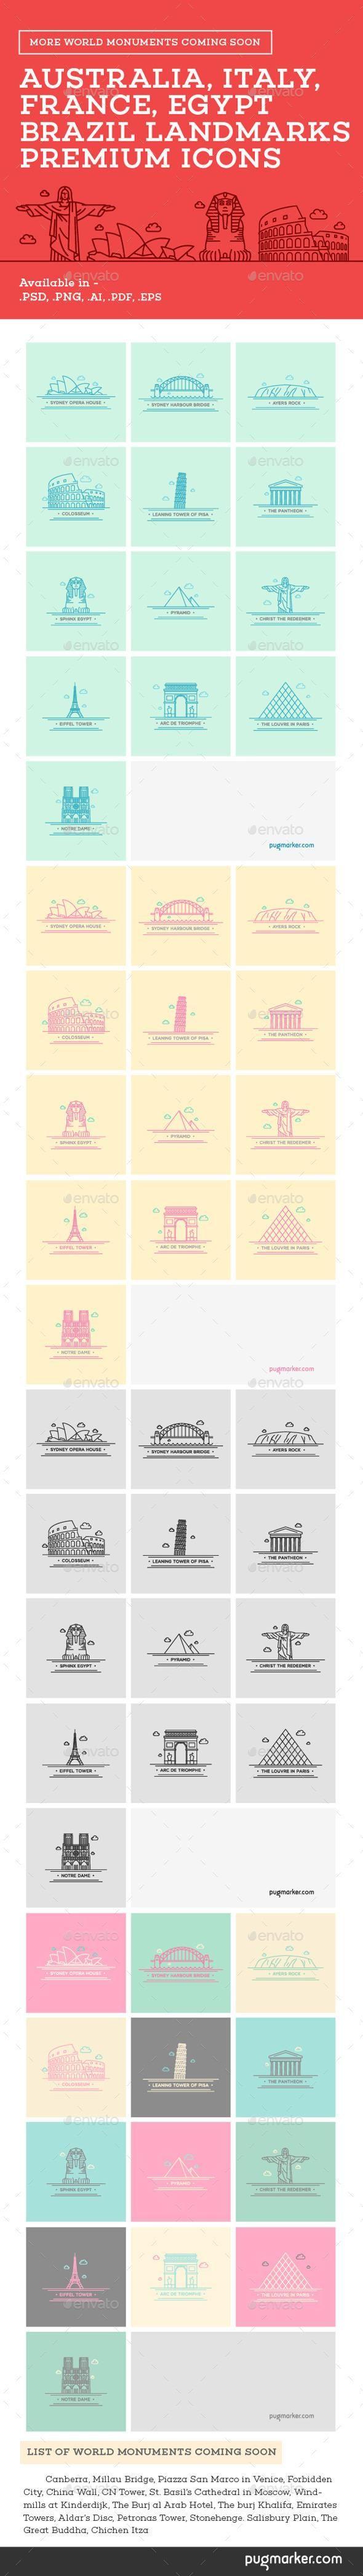 World Landmarks Icons - Vol. 1